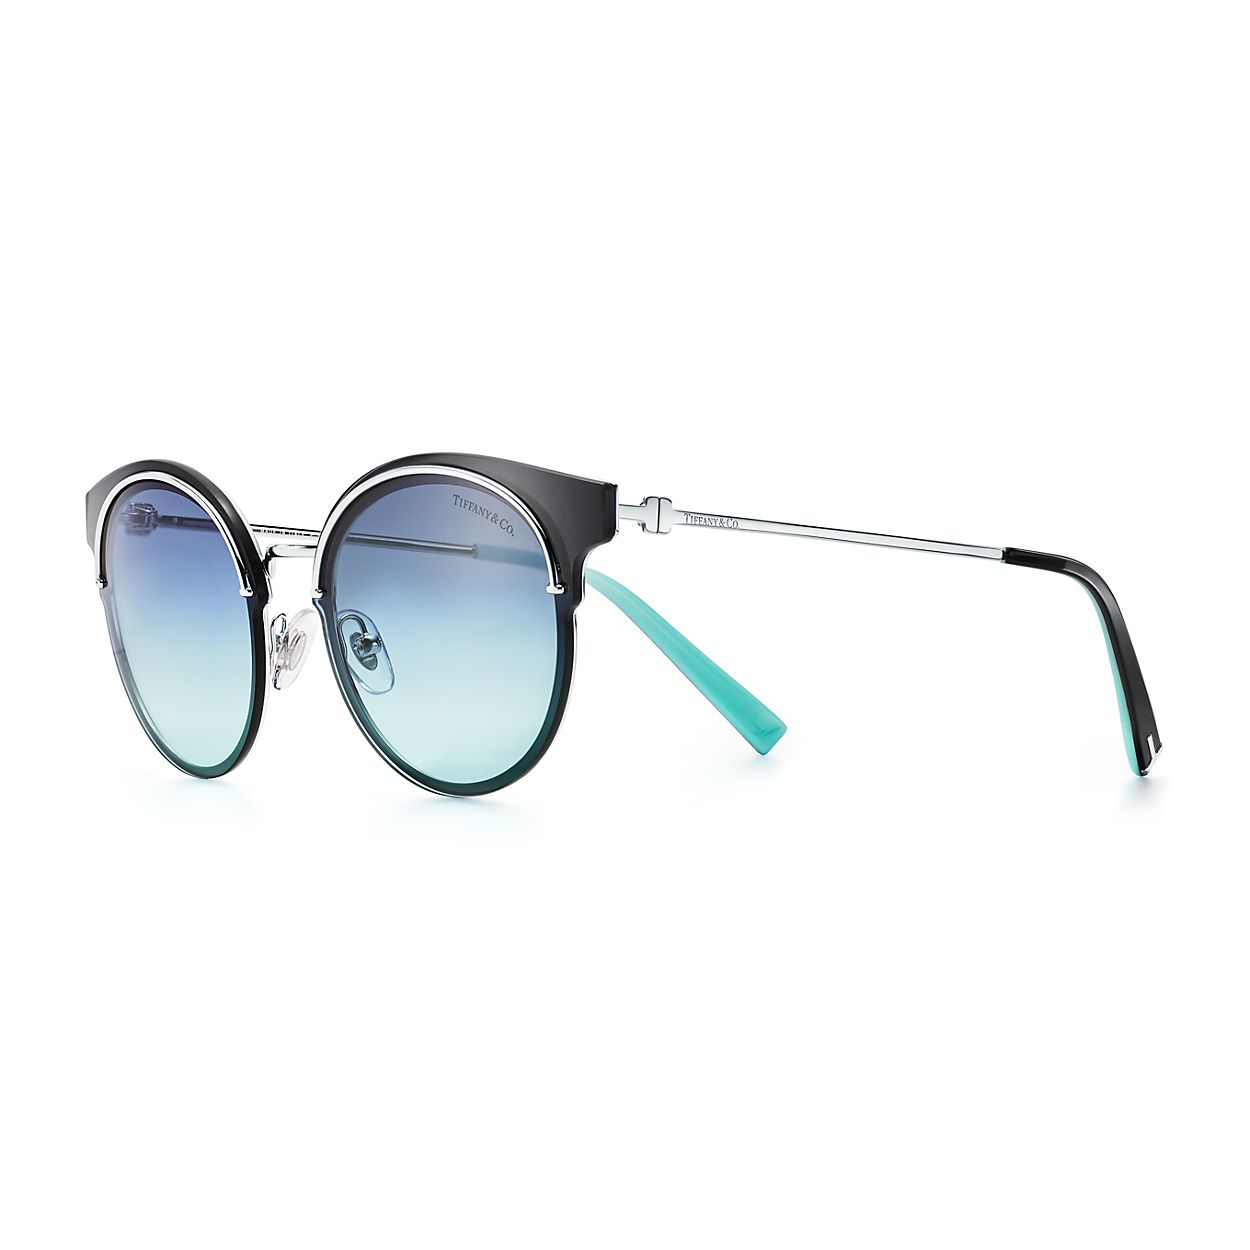 c0610027c1e Tiffany T Round Sunglasses Tiffany T Round Sunglasses